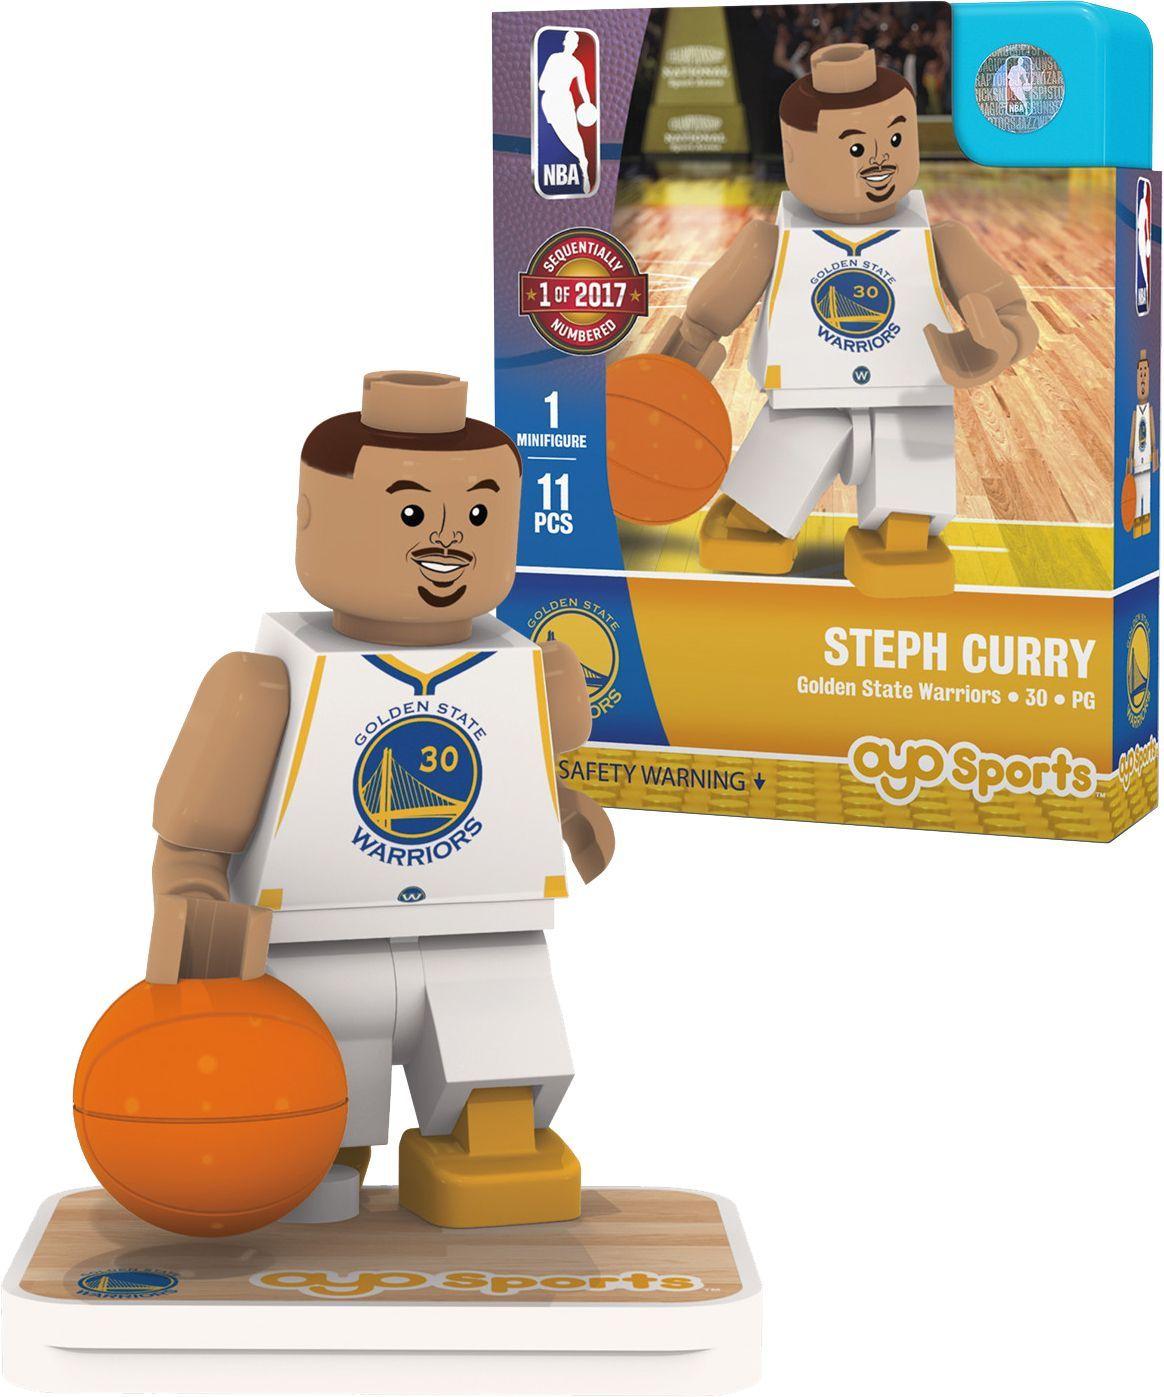 OYO Golden State Warriors Stephen Curry Figurine, Team